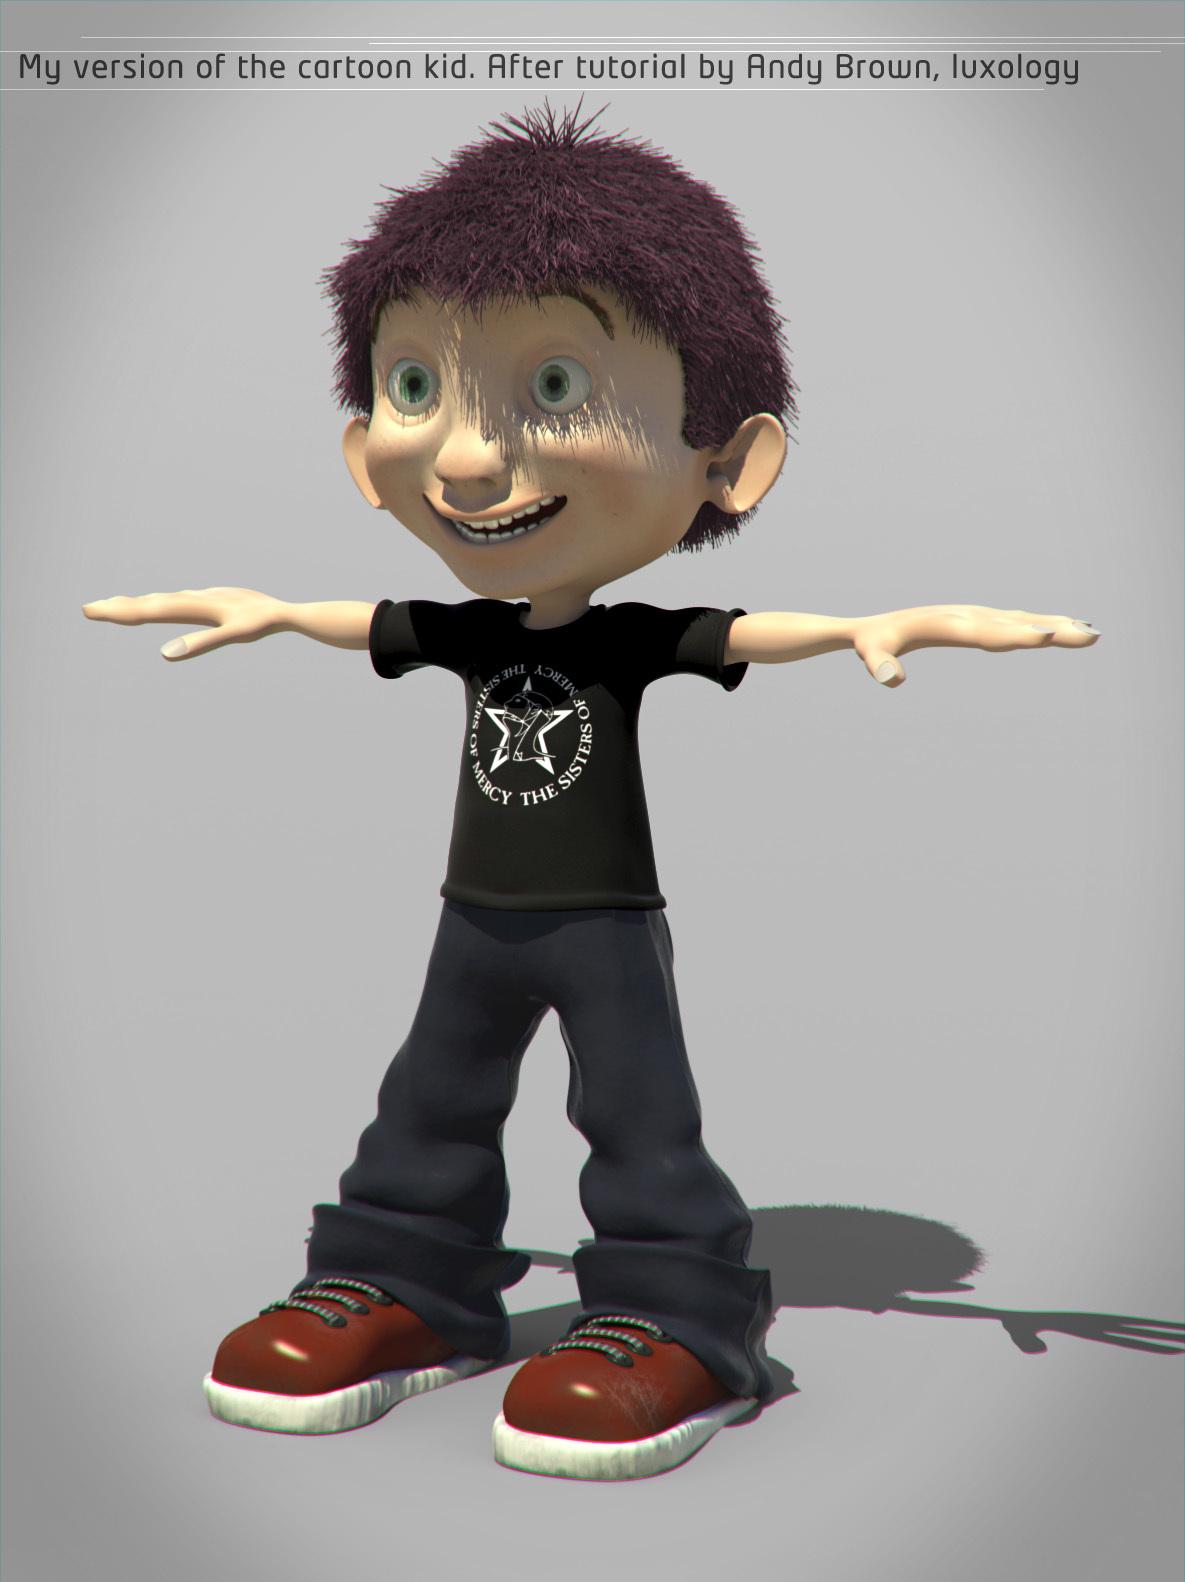 Profusion cartoon kid 1 2333d4f9 5frg